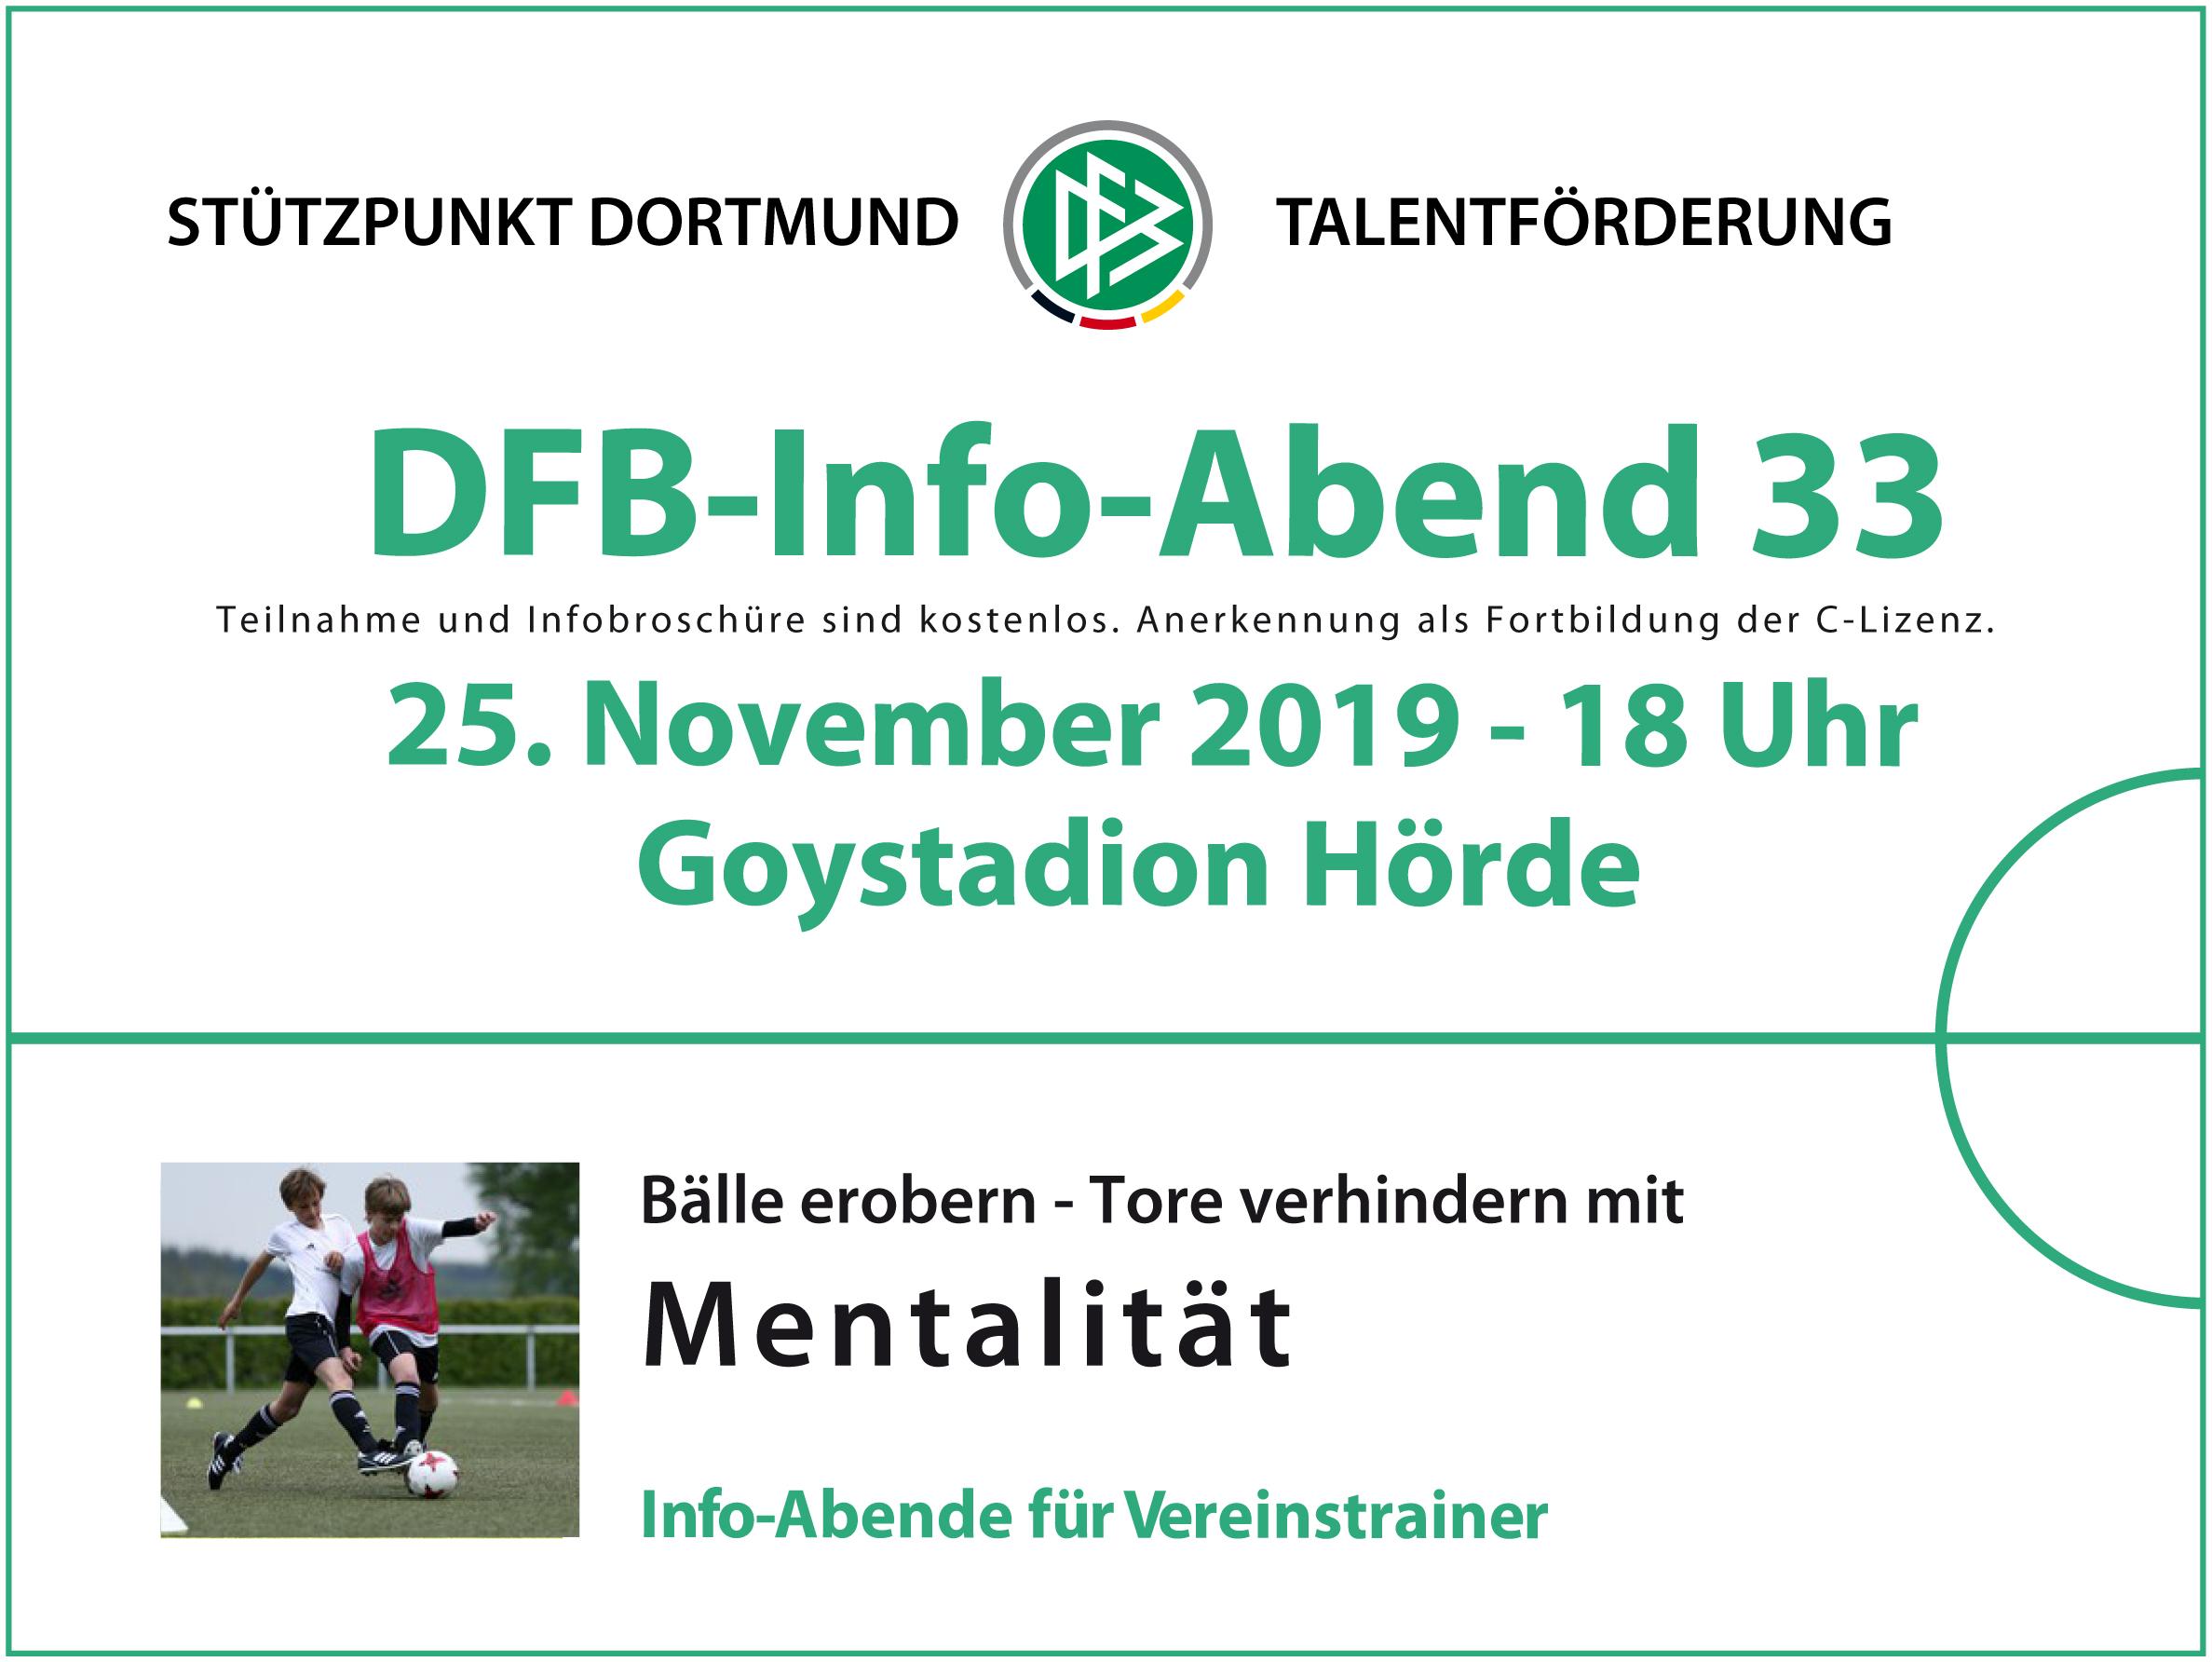 DFB-Infoabend am 25. November 2019